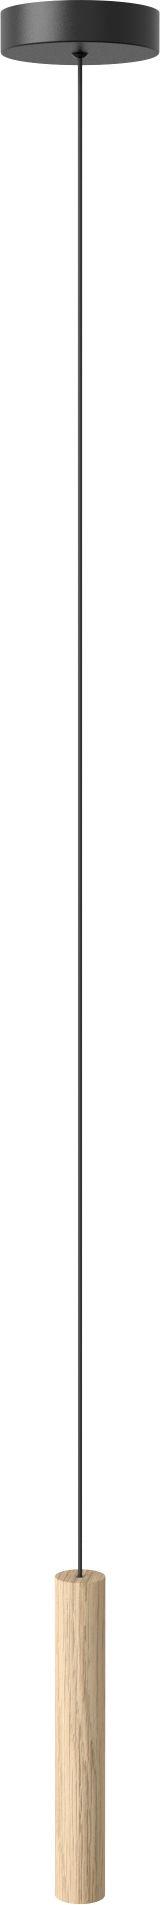 Lampa wisząca Chimes 2165 VITA copenhagen drewniana lampa wisząca